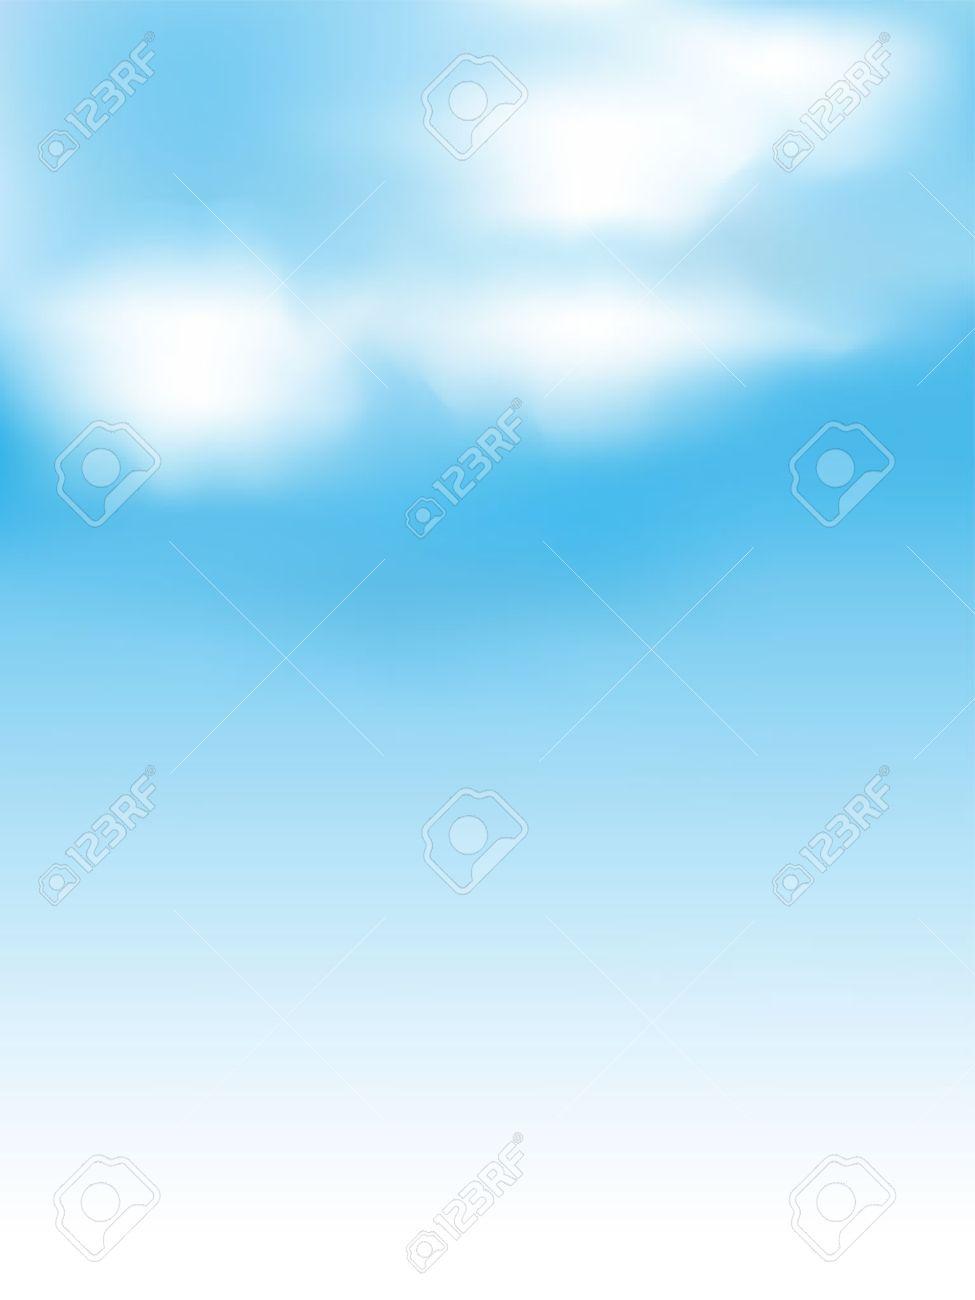 Sky clouds landscape background - 52155876